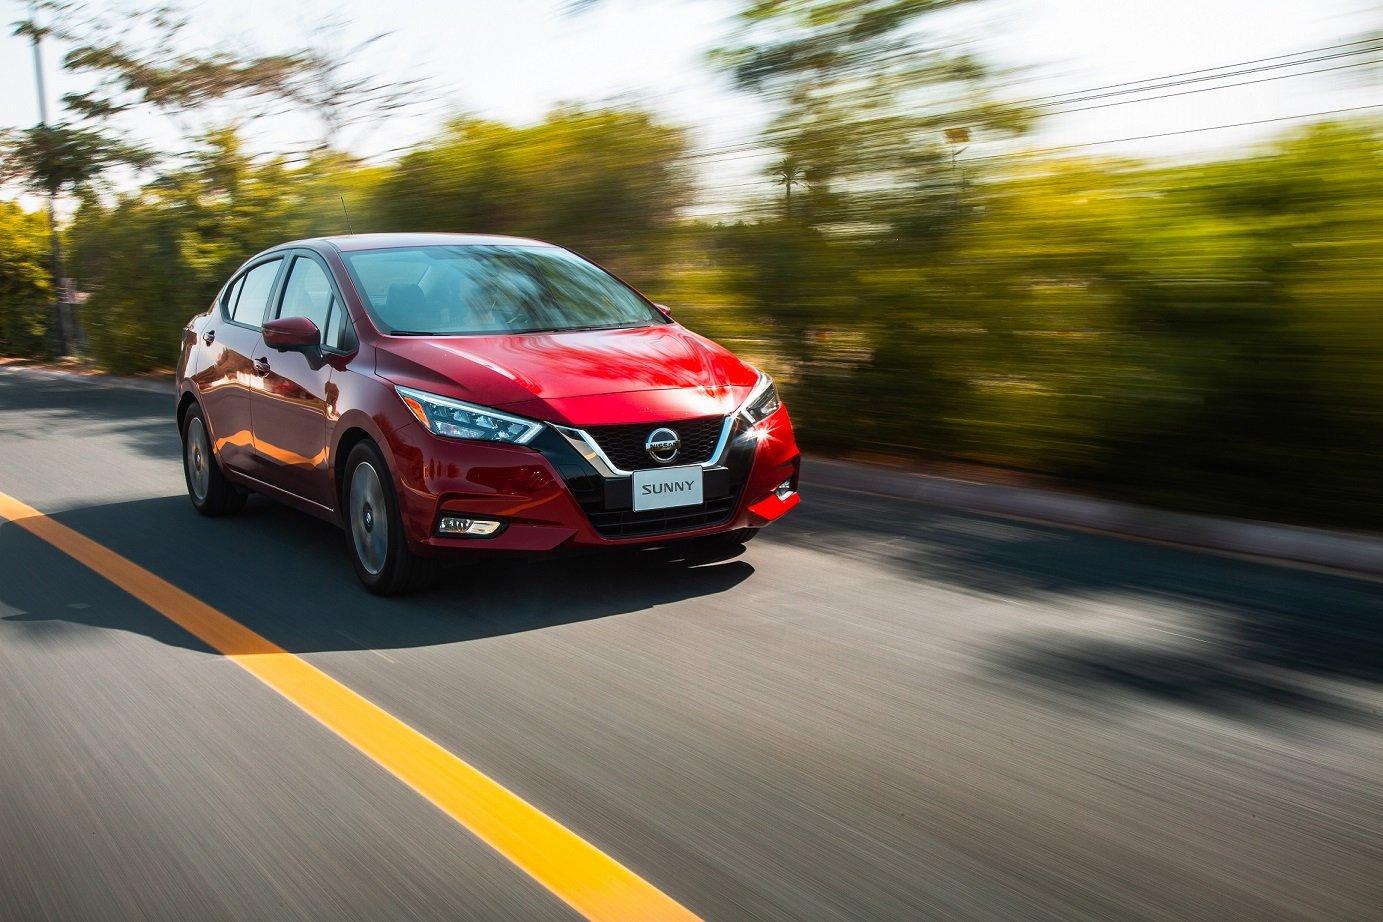 2020 Nissan Sunny price in UAE